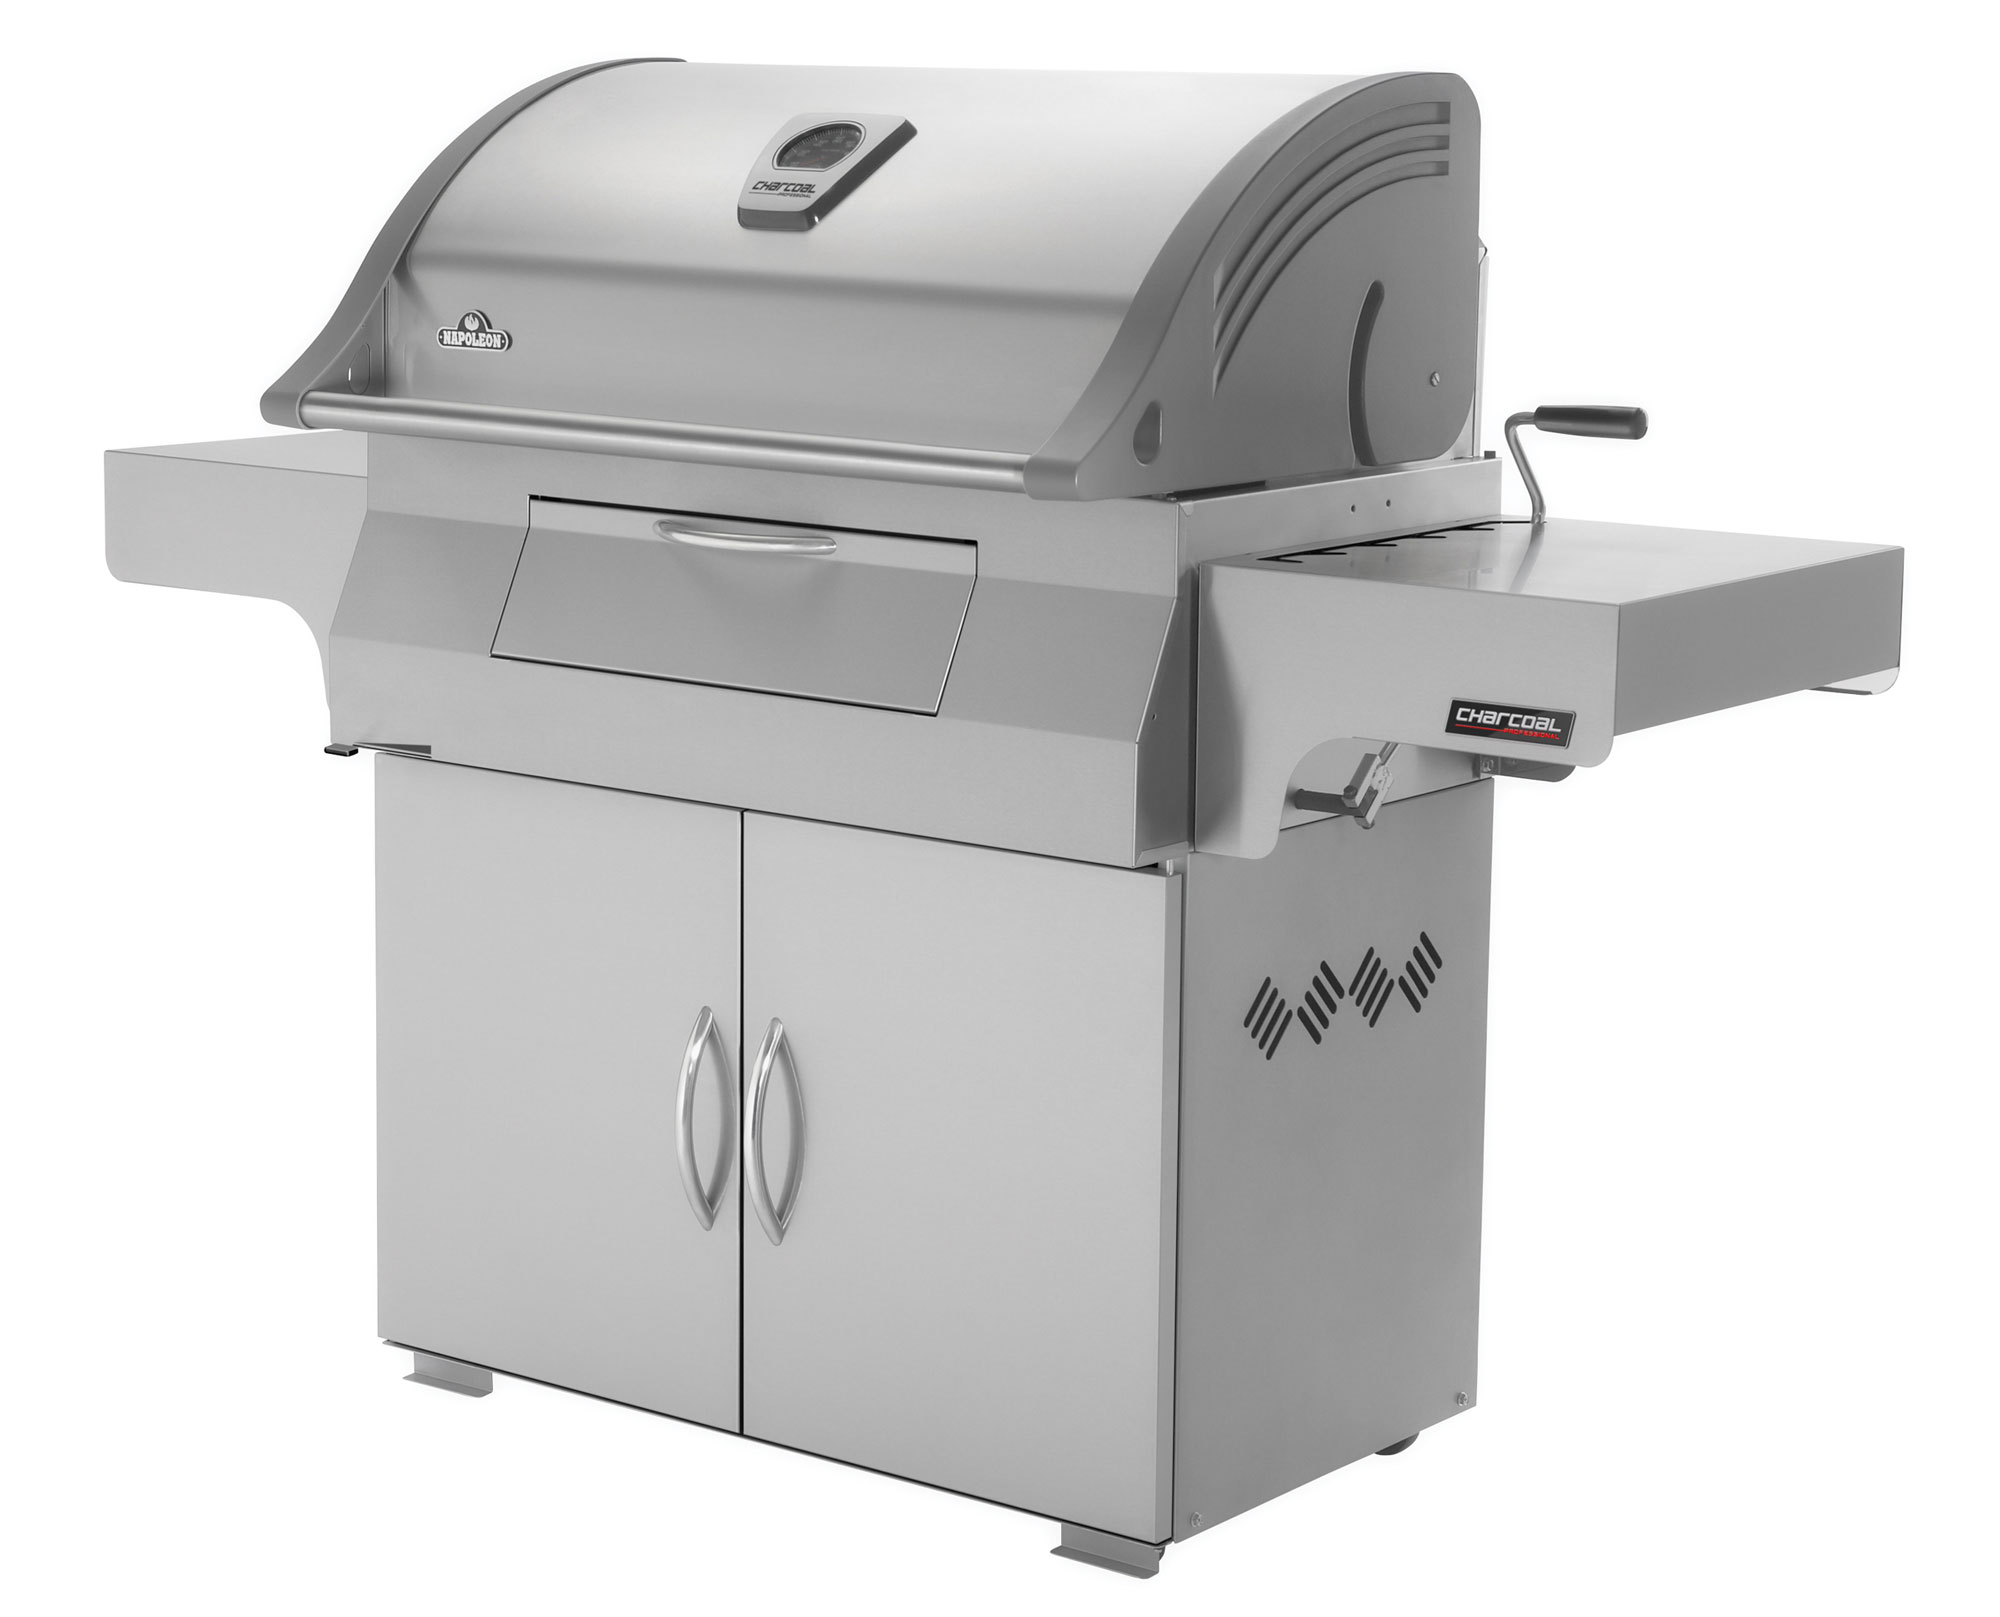 Napoleon Holzkohlegrill Charcoal : Holzkohlegrill grill napoleon charcoal professional pro